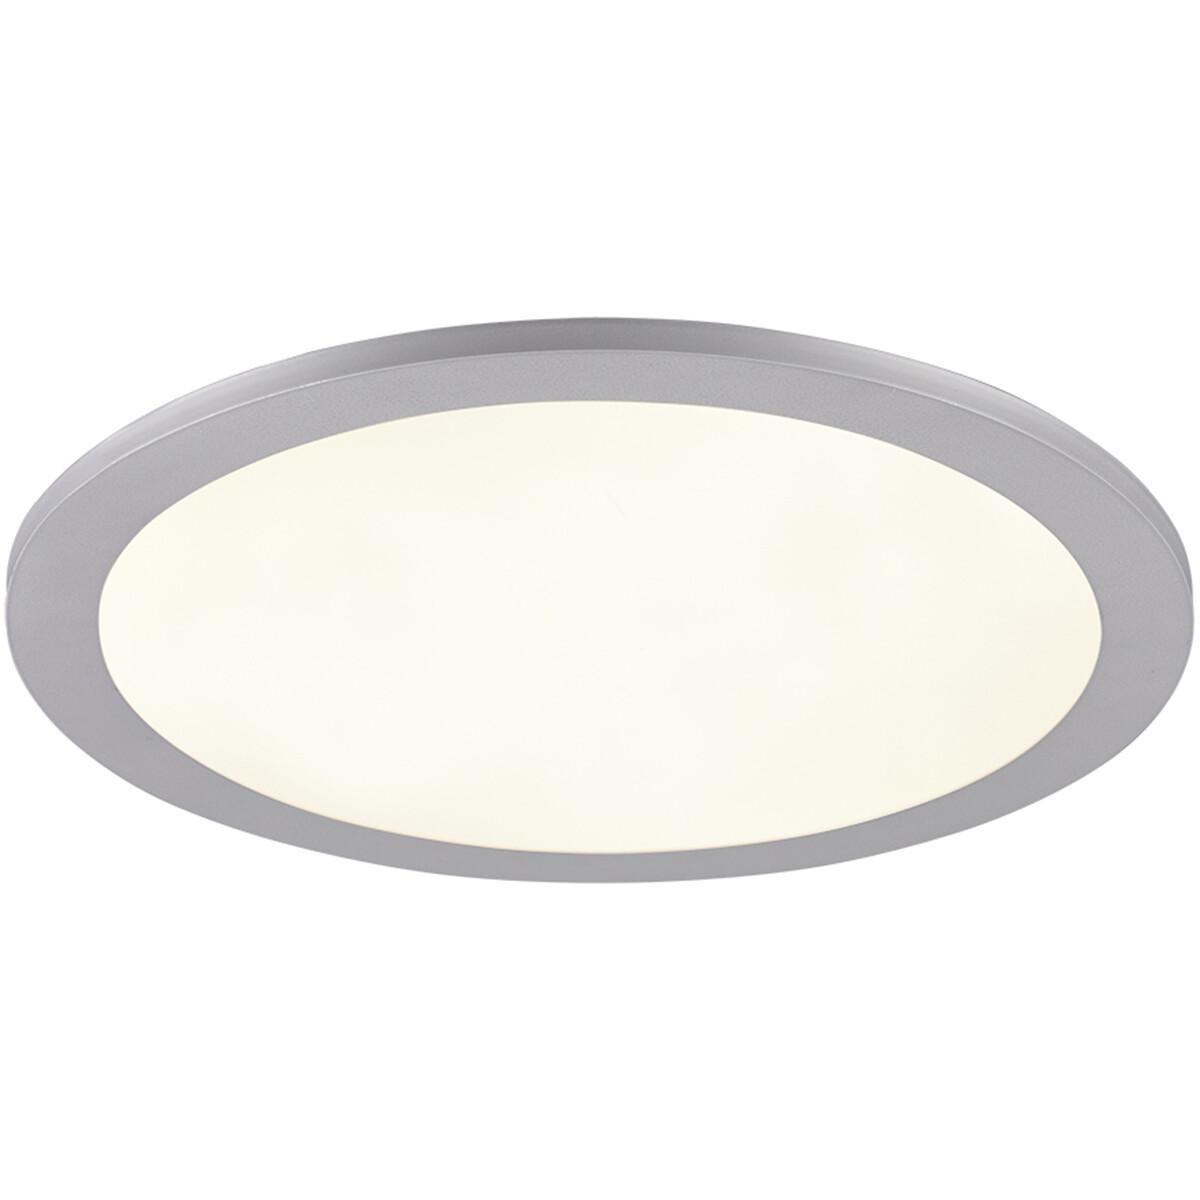 LED Plafondlamp - Plafondverlichting - Trion Tiberon - 16W - Natuurlijk Wit 4000K - Rond - Mat Titaa